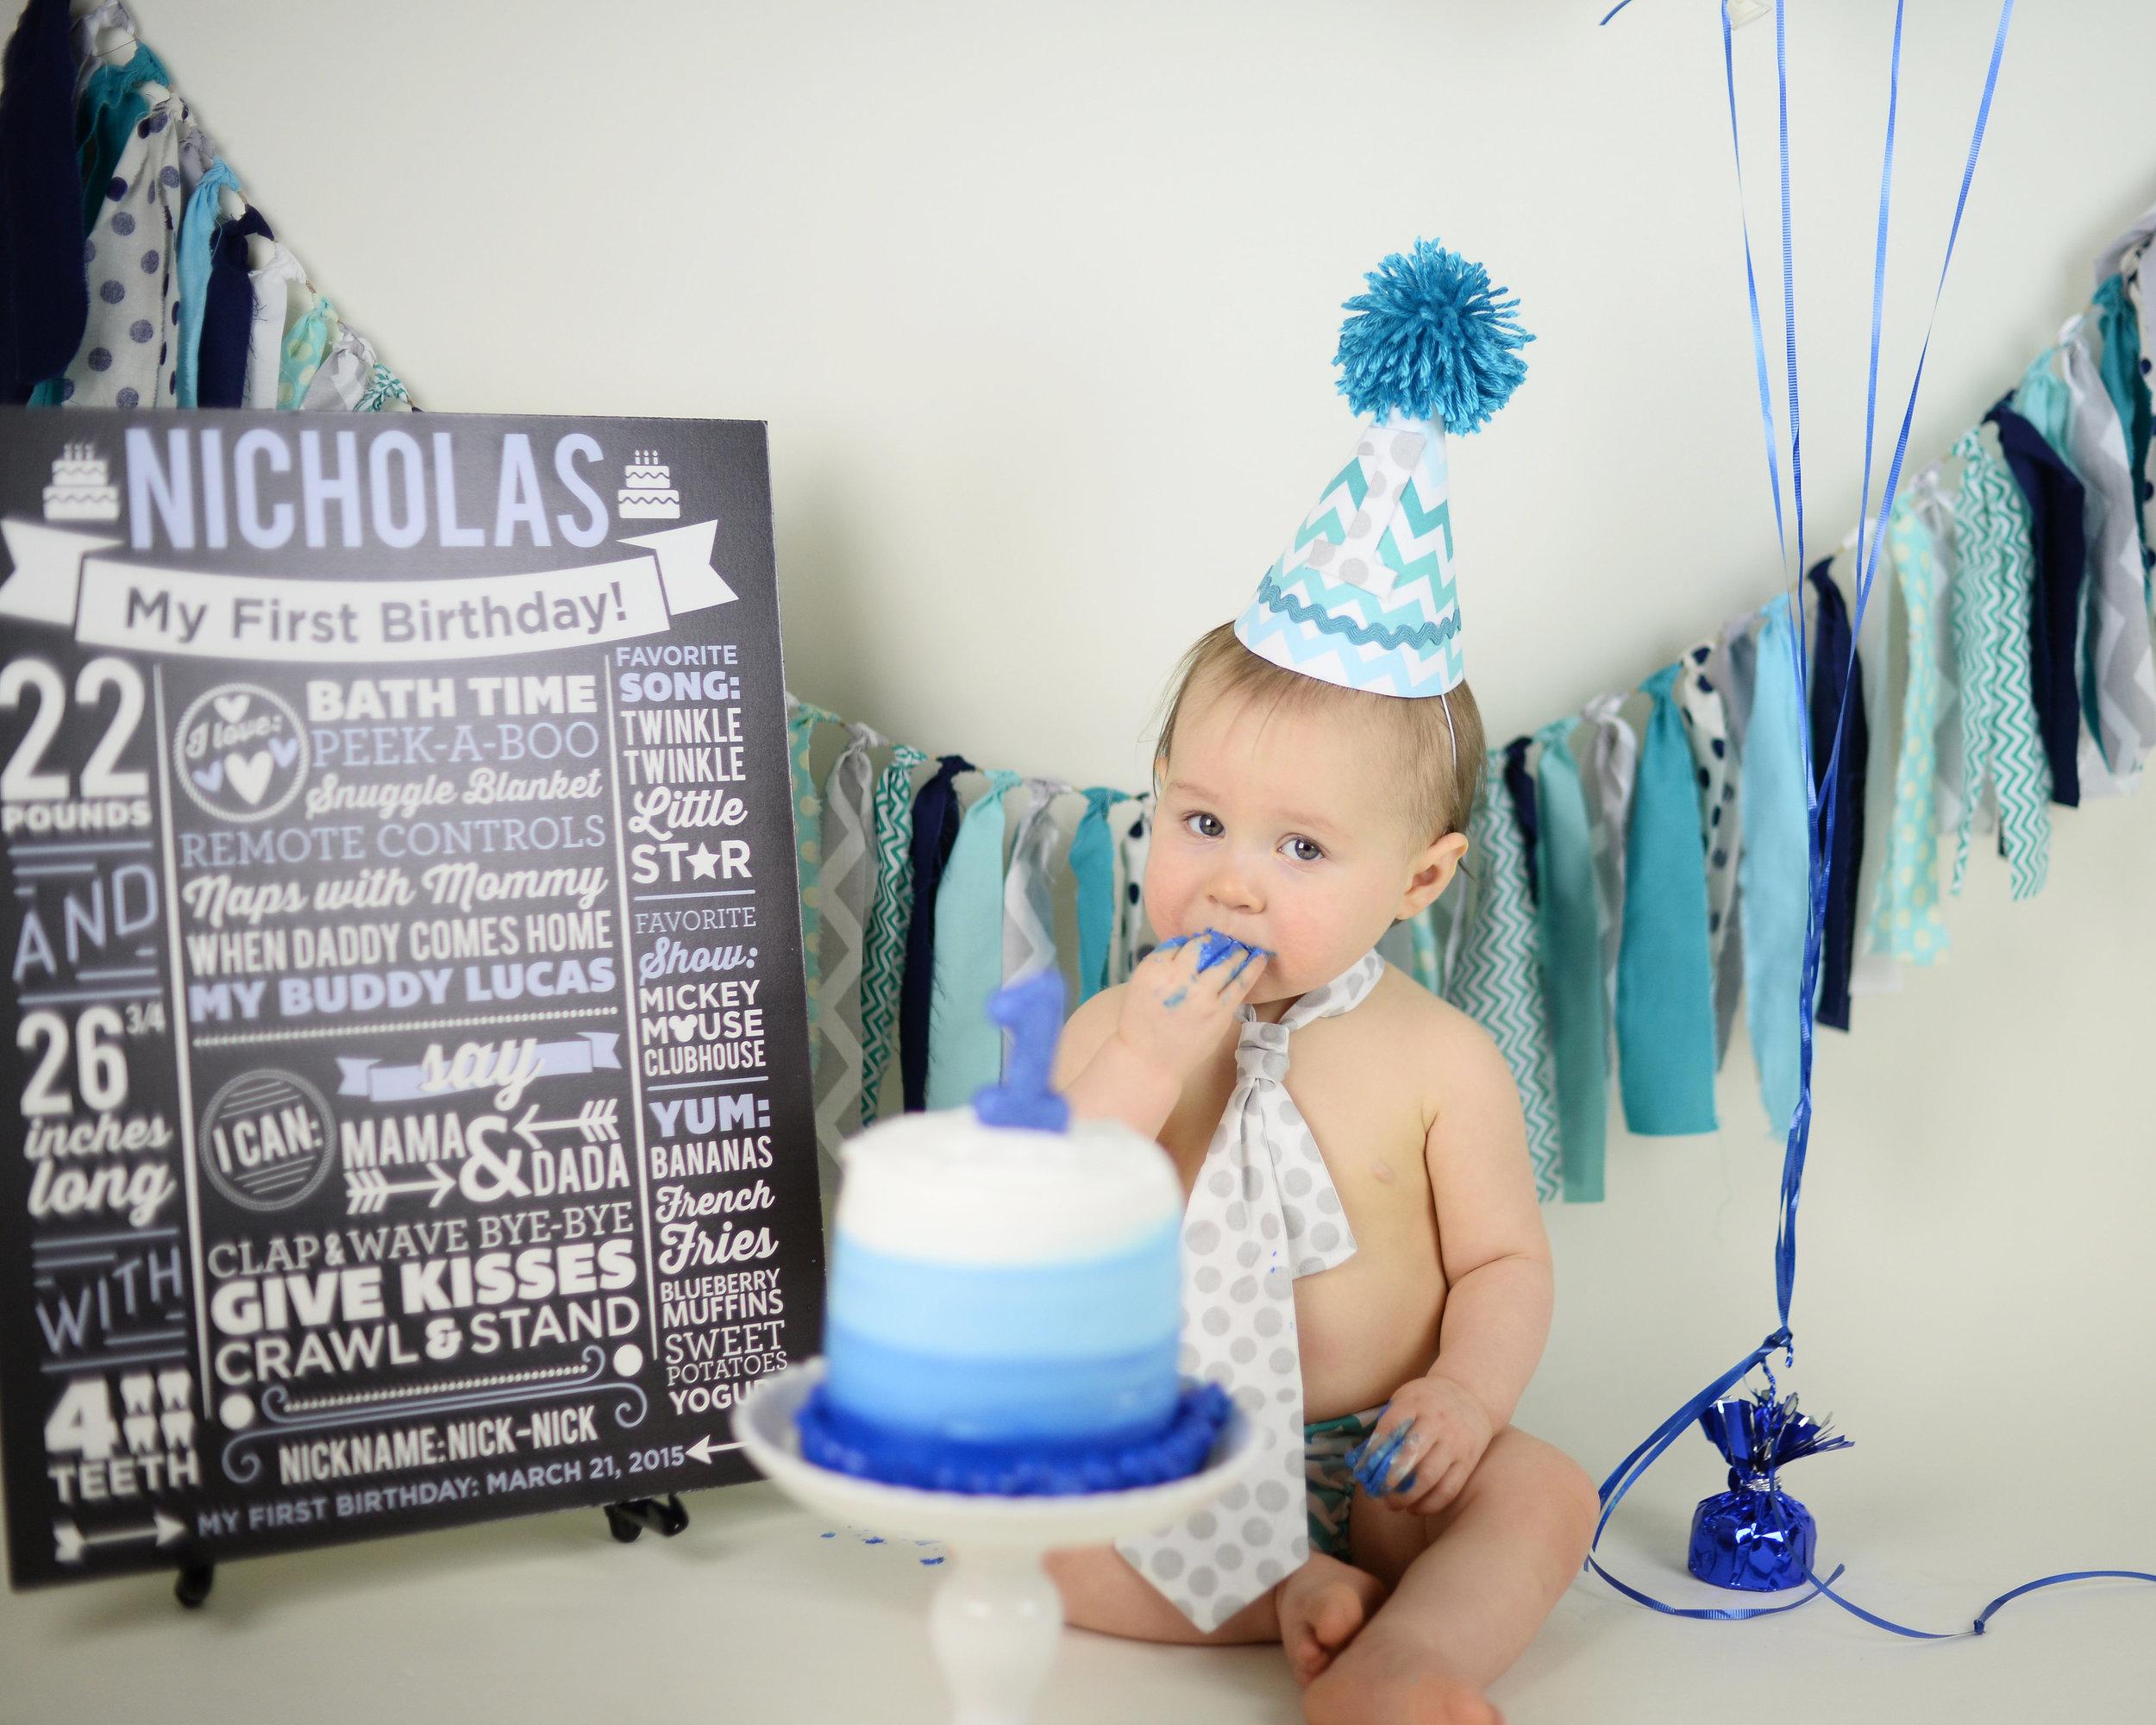 I also made a print for the birthday boy! Too precious.Photo by Brandy Robles.